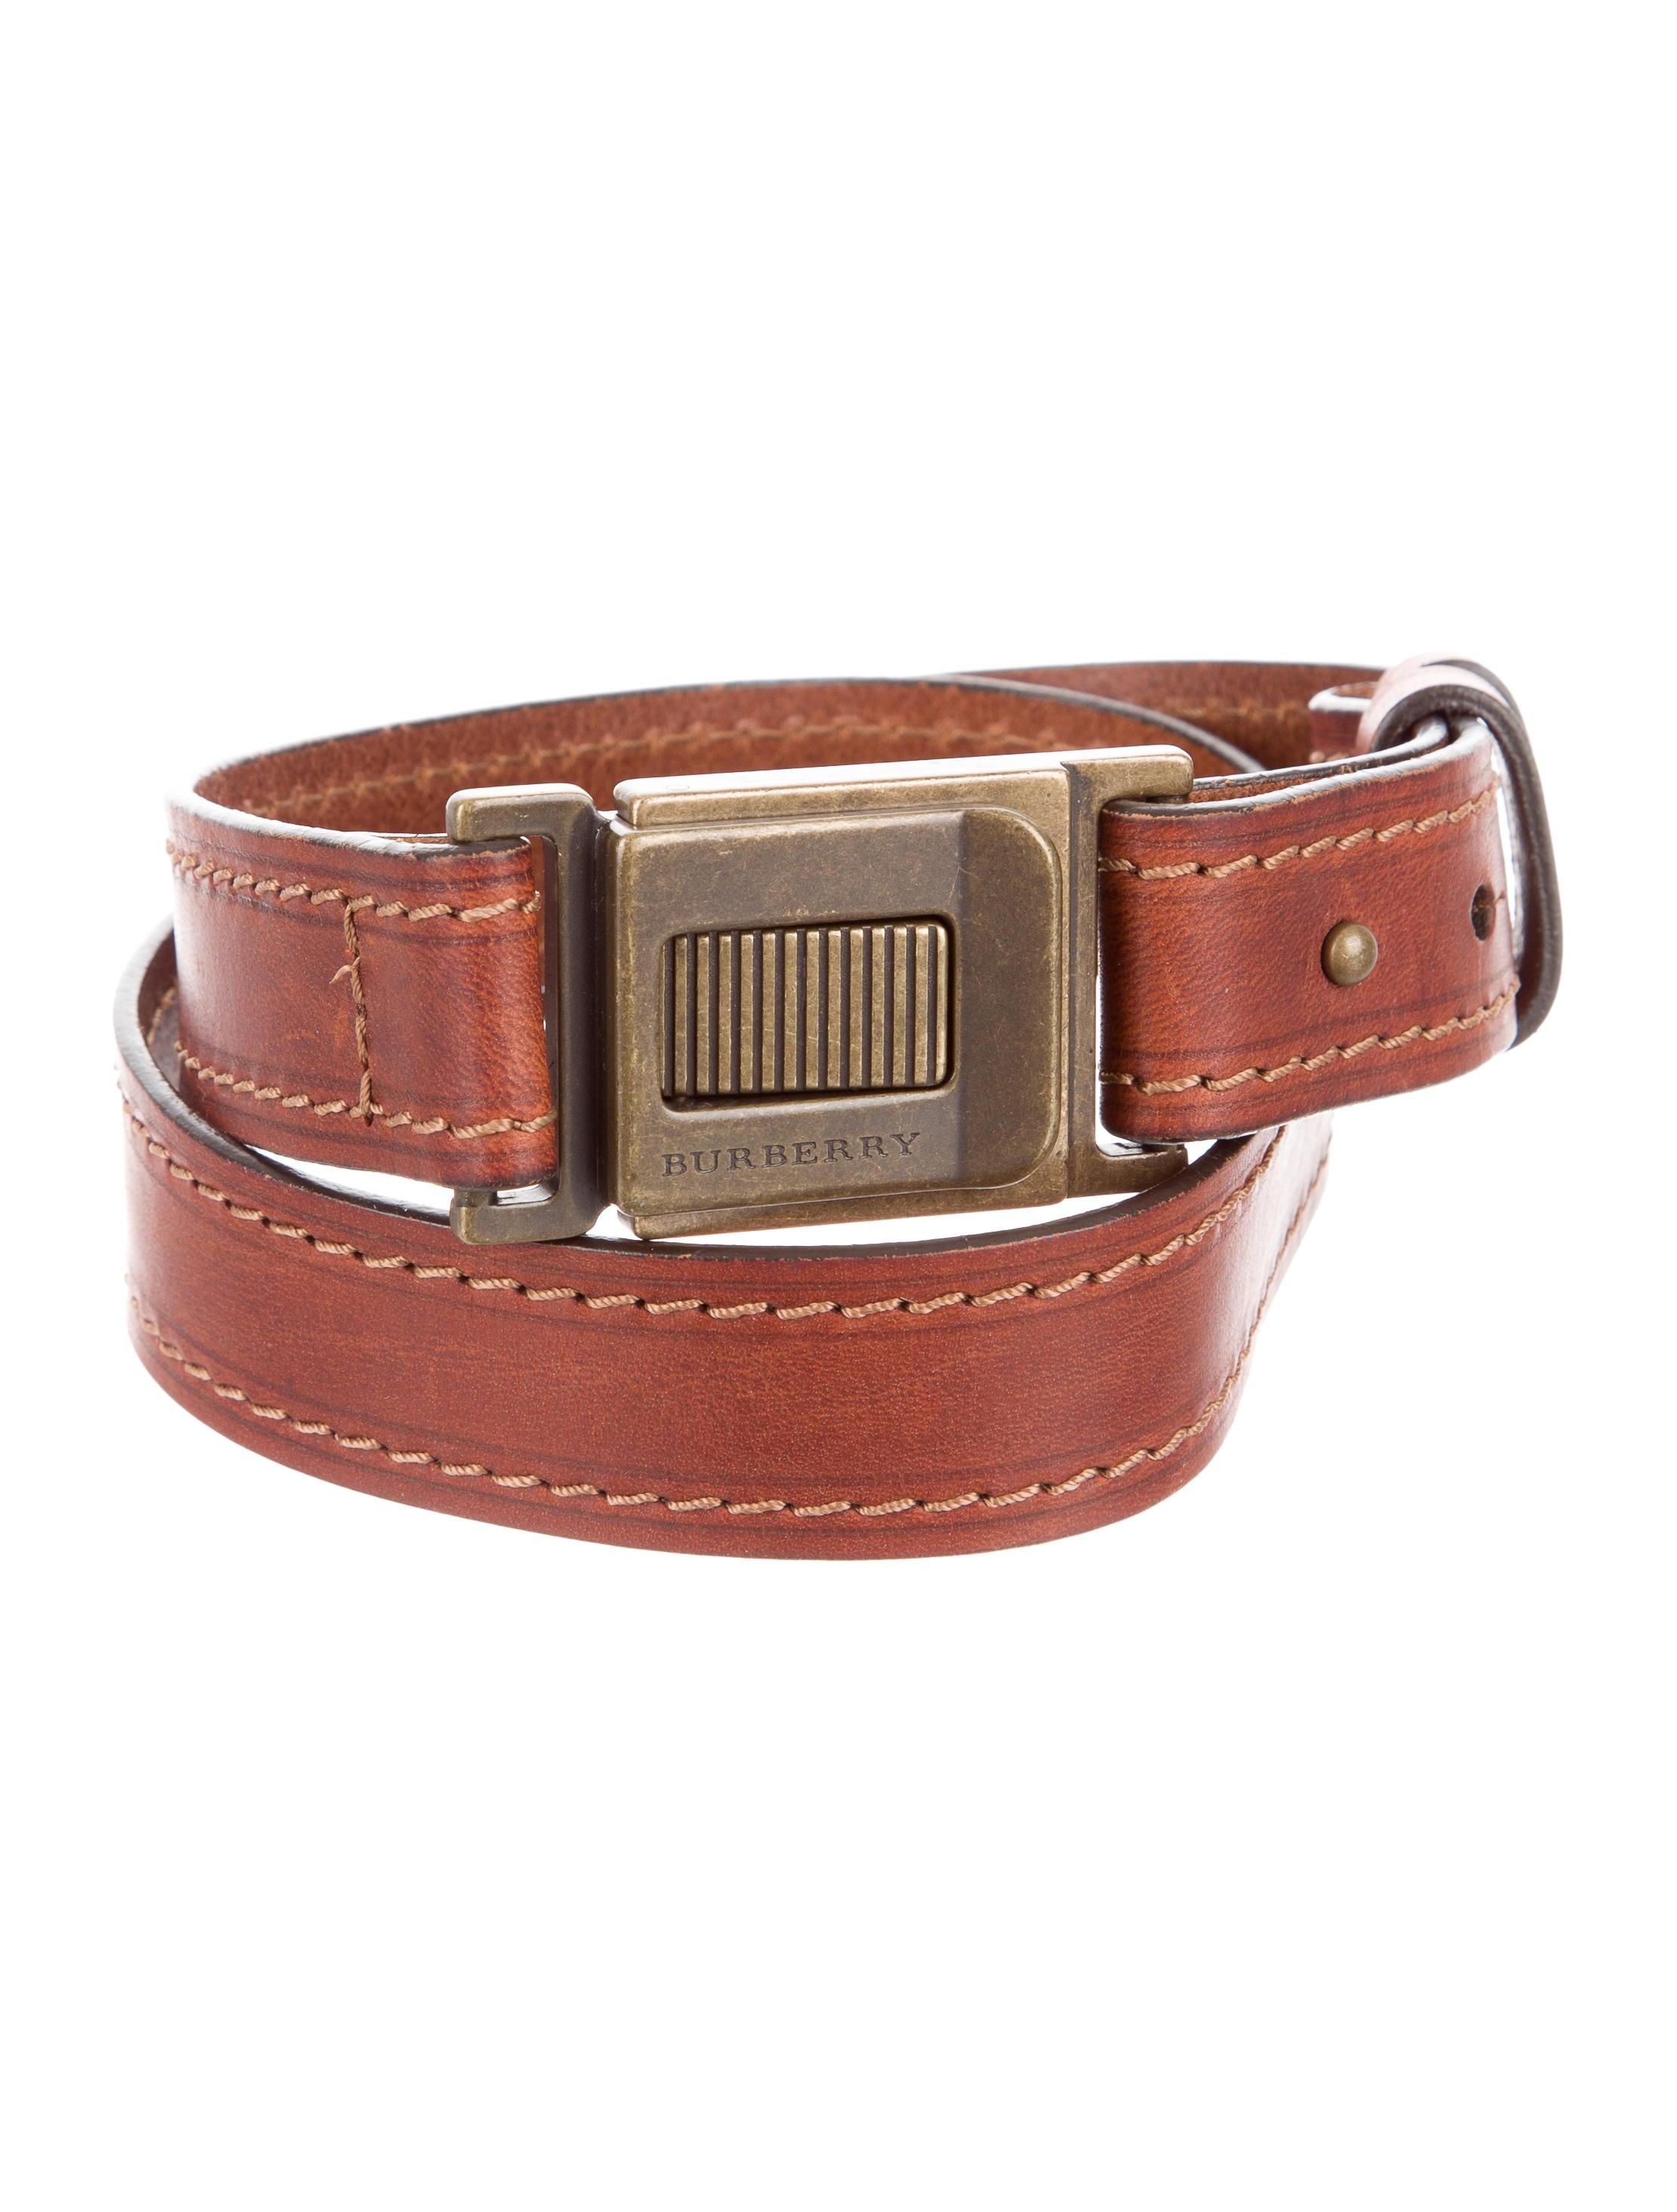 burberry adjustable leather belt accessories bur72717